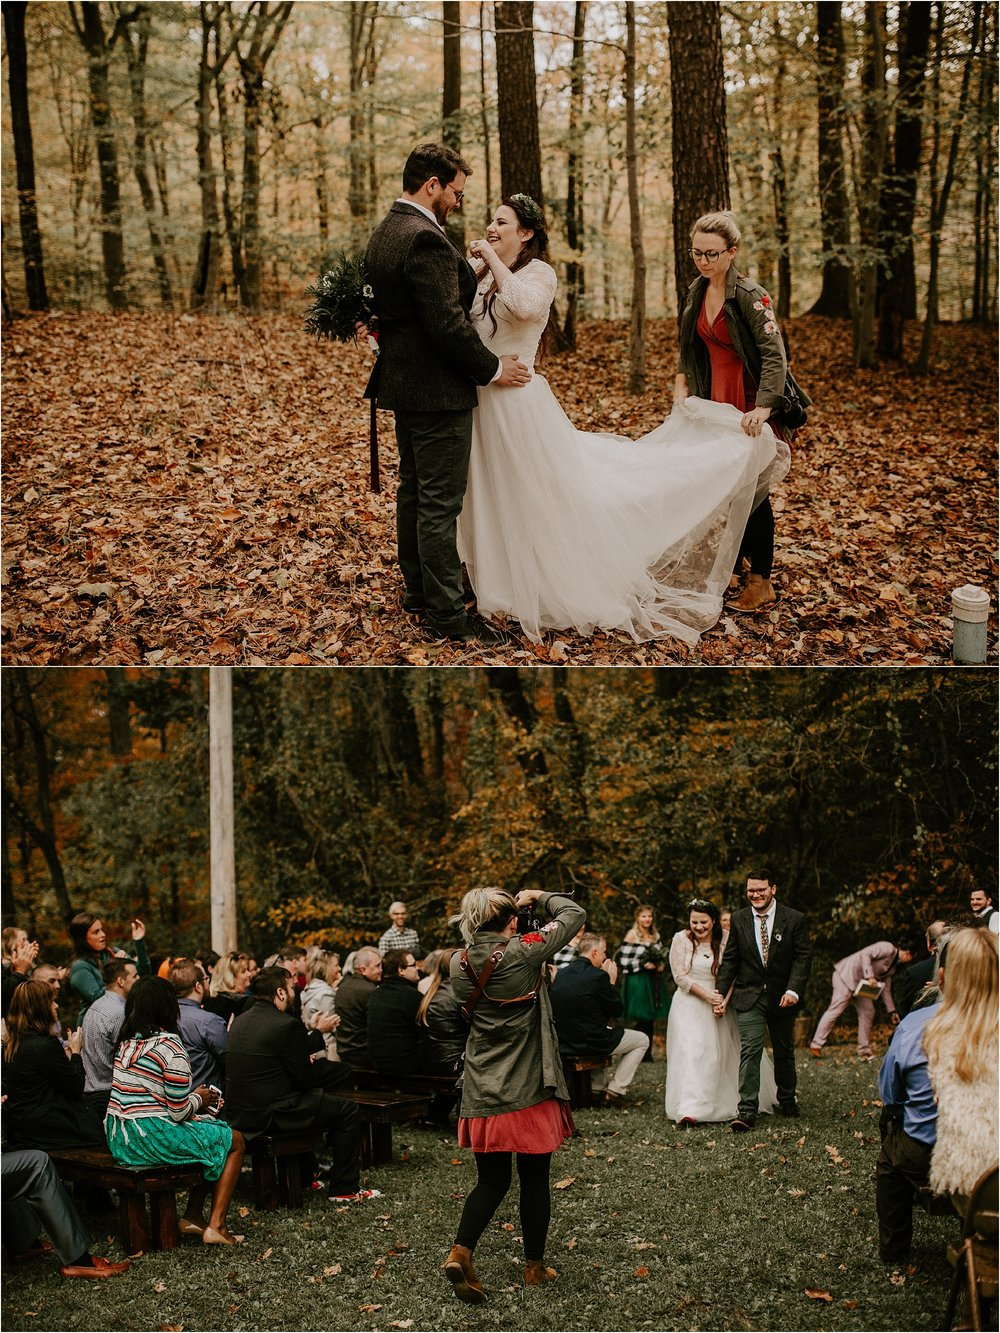 Sarah_Brookhart_PA_MD_Wedding_Photographer_0015.jpg